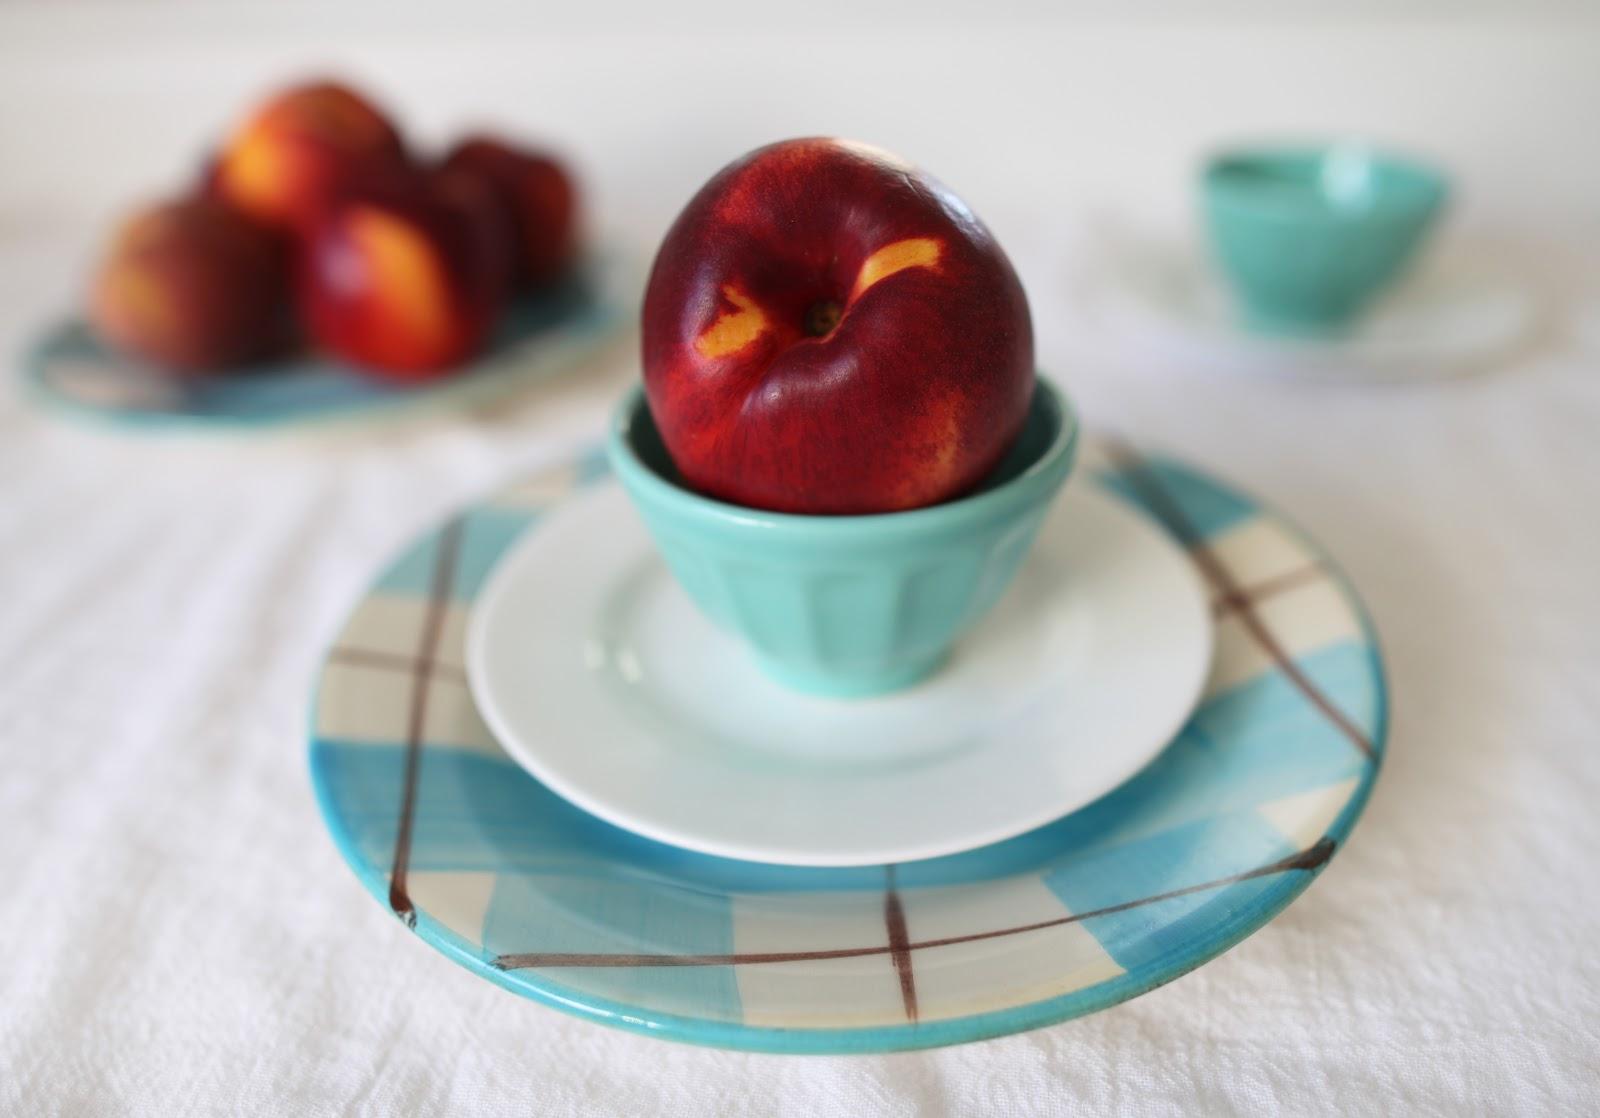 Pretty Peaches Picture Image And Wallpaper Download